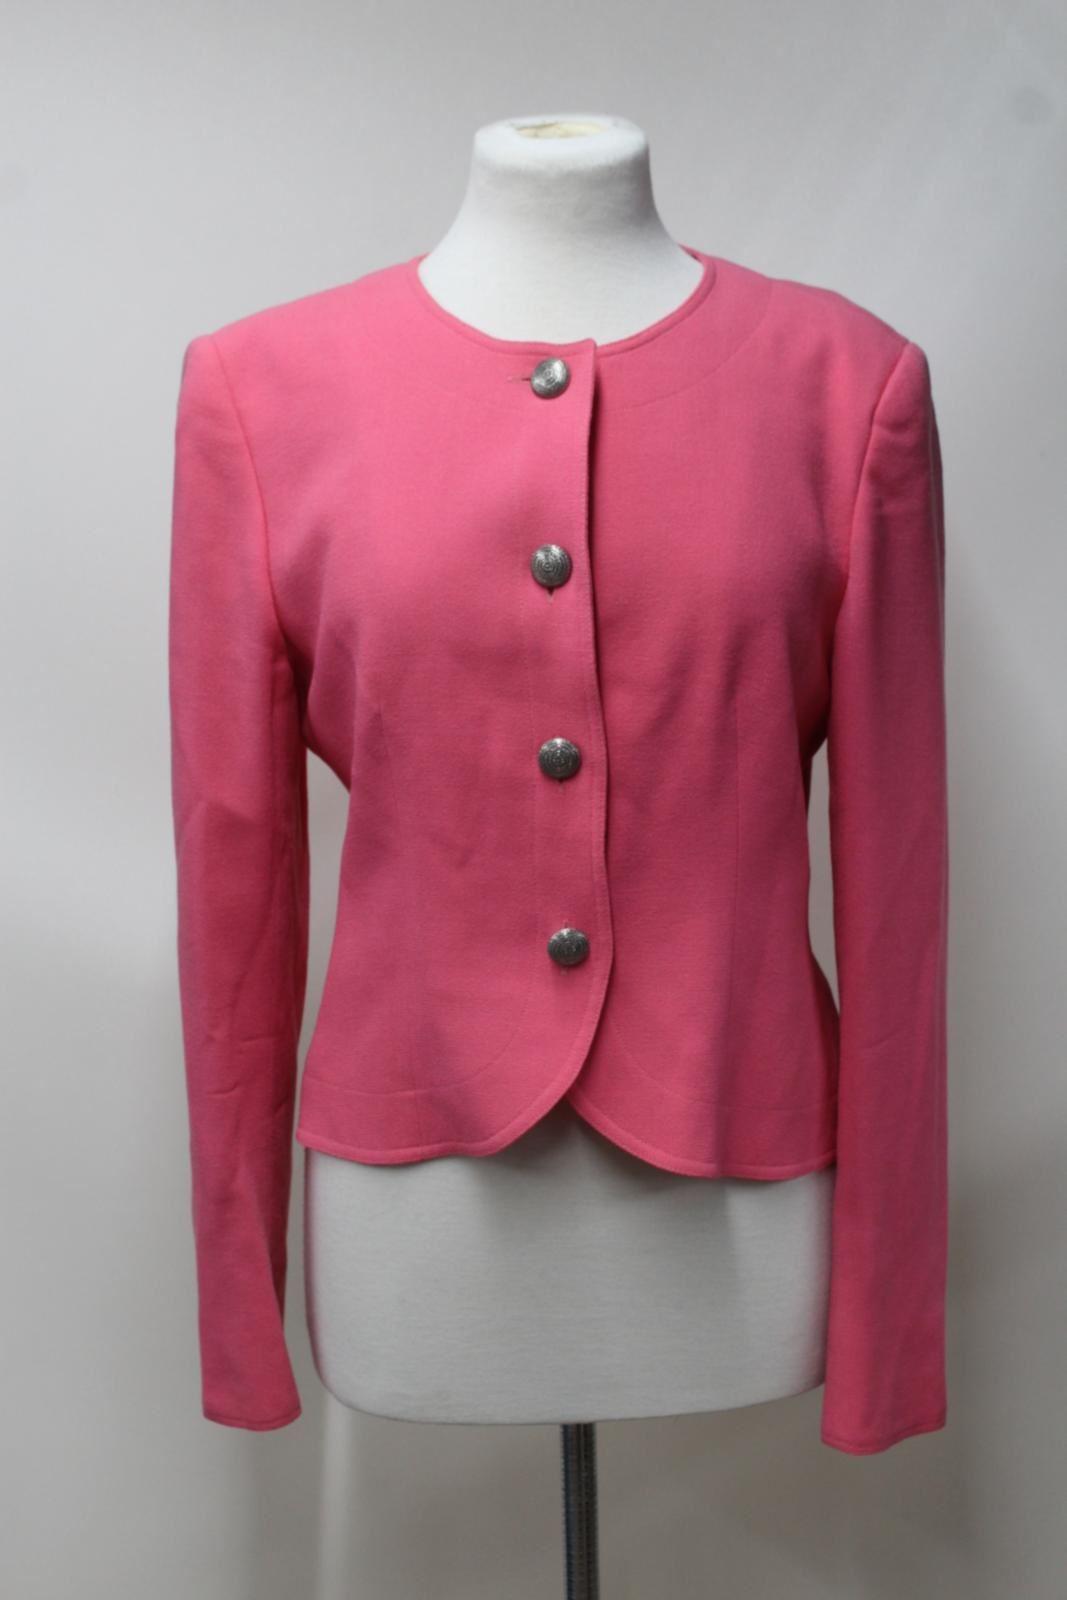 Uk12 Jacket Neck Scoop Pink Collarless Button Crew Up Wool Ladies Jaeger wzgIvv